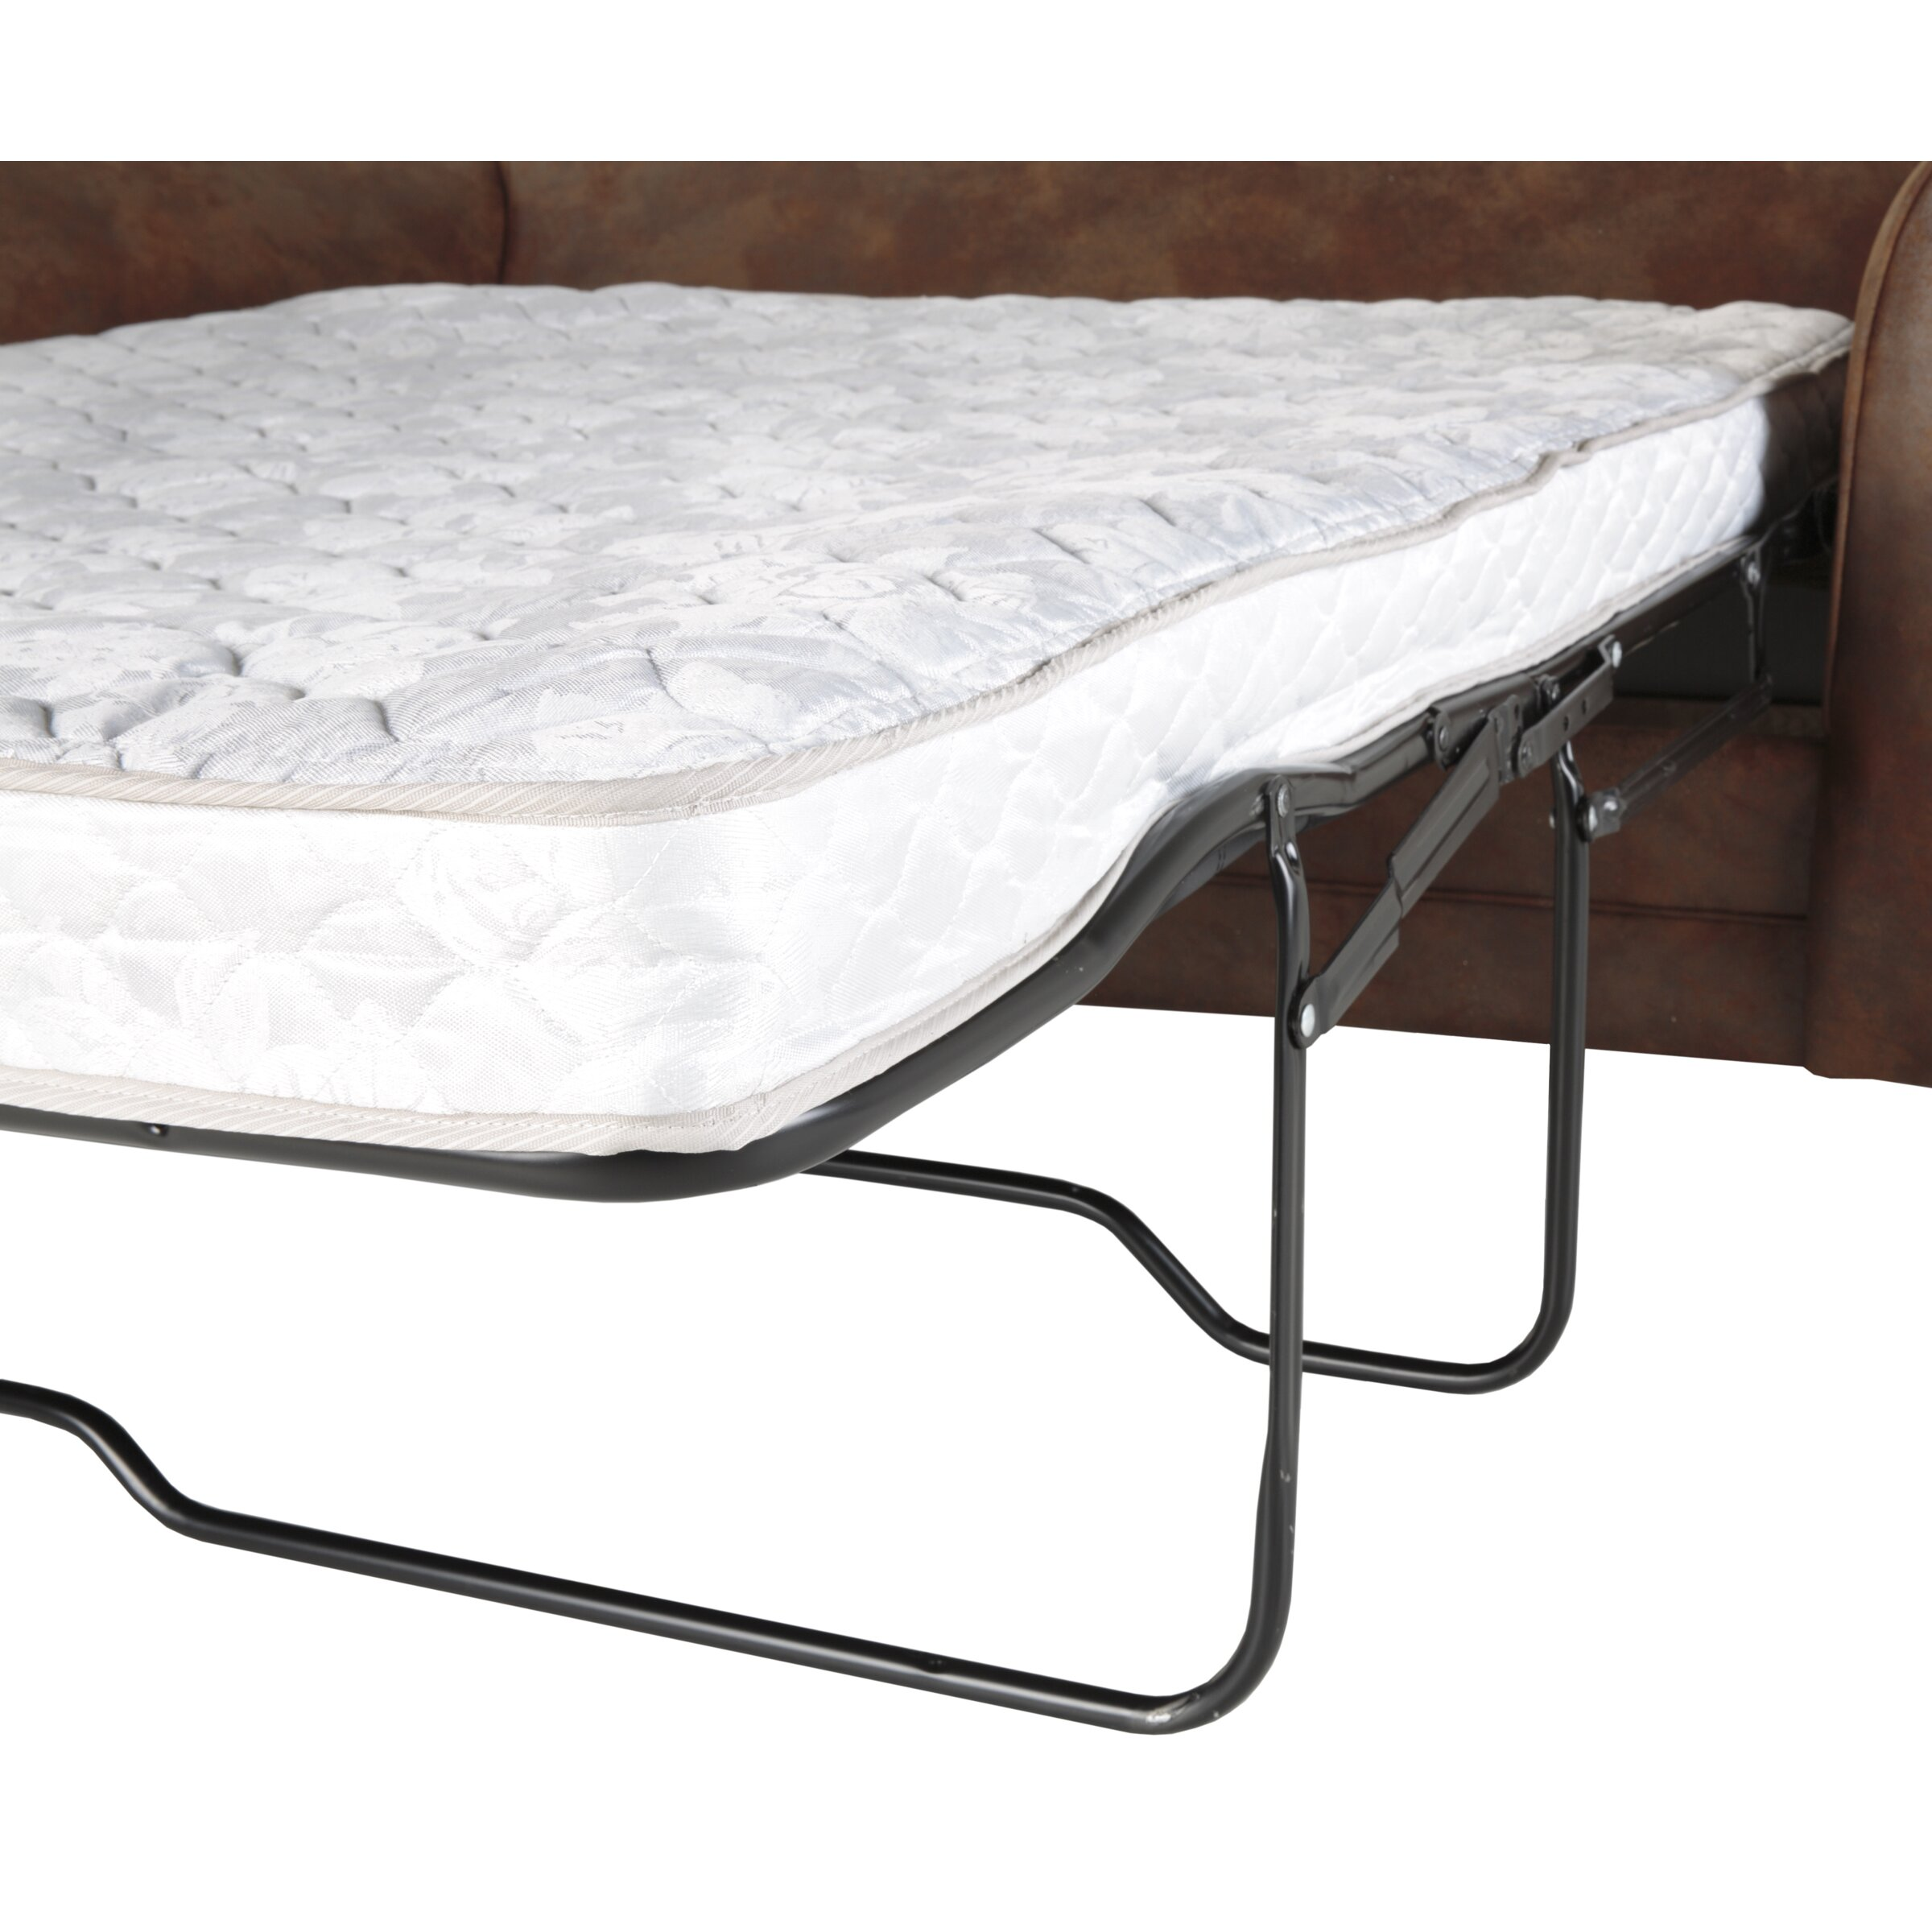 American furniture classics deer valley 4 piece living room set with sleeper sofa